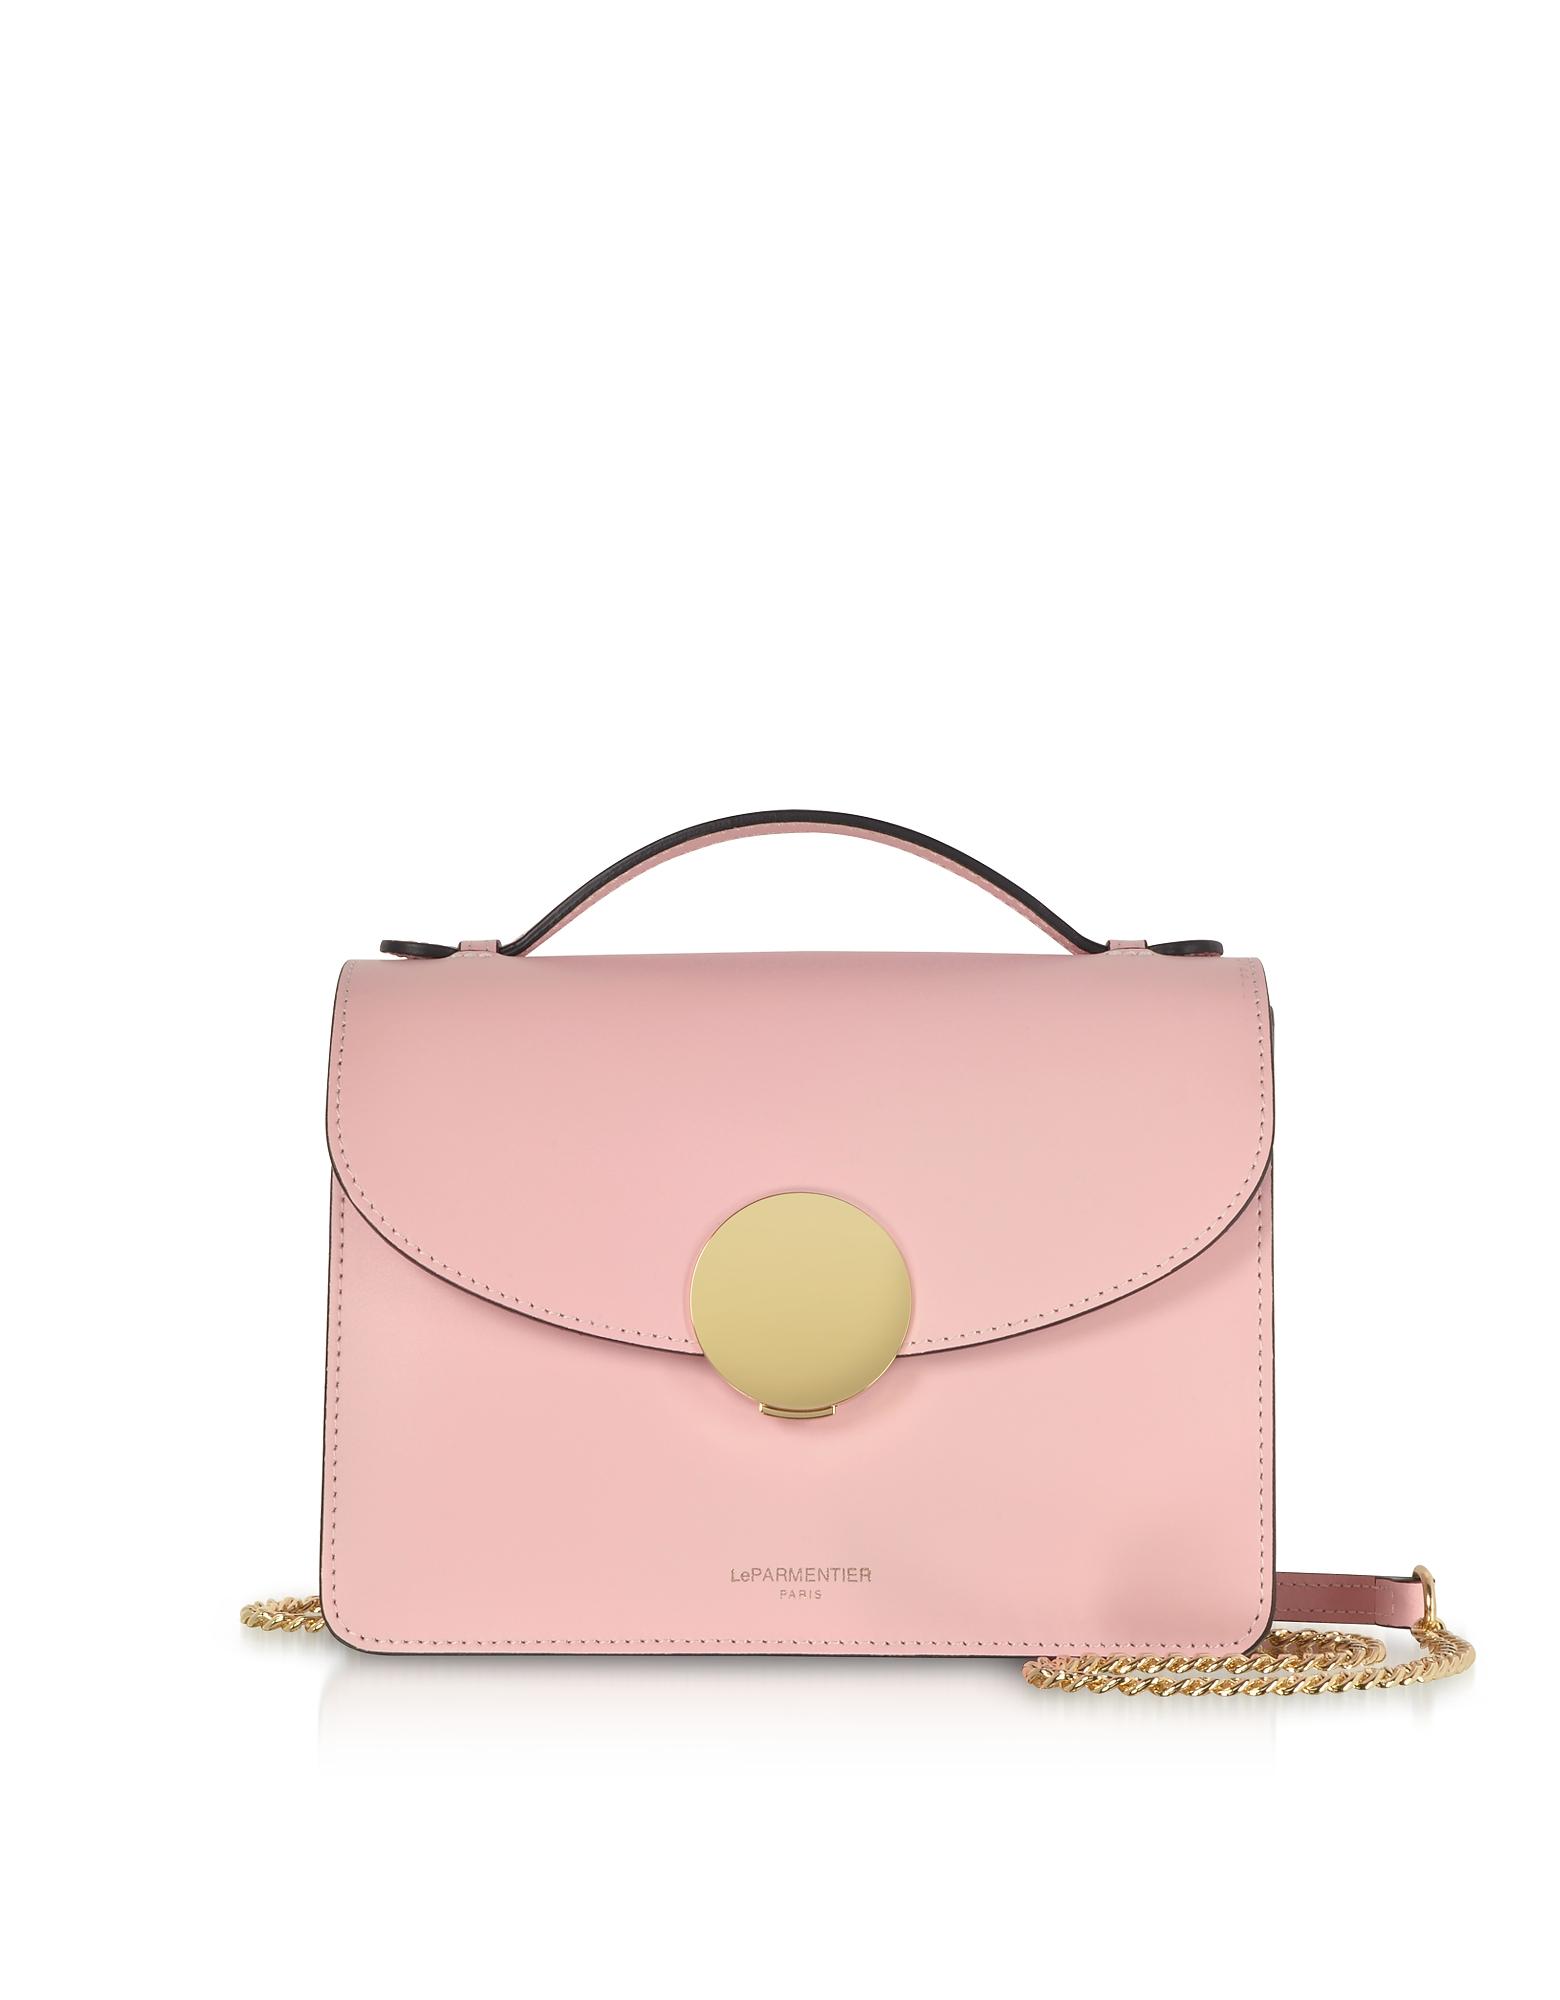 Le Parmentier Handbags, New Ondina Top Handle Shoulder Bag